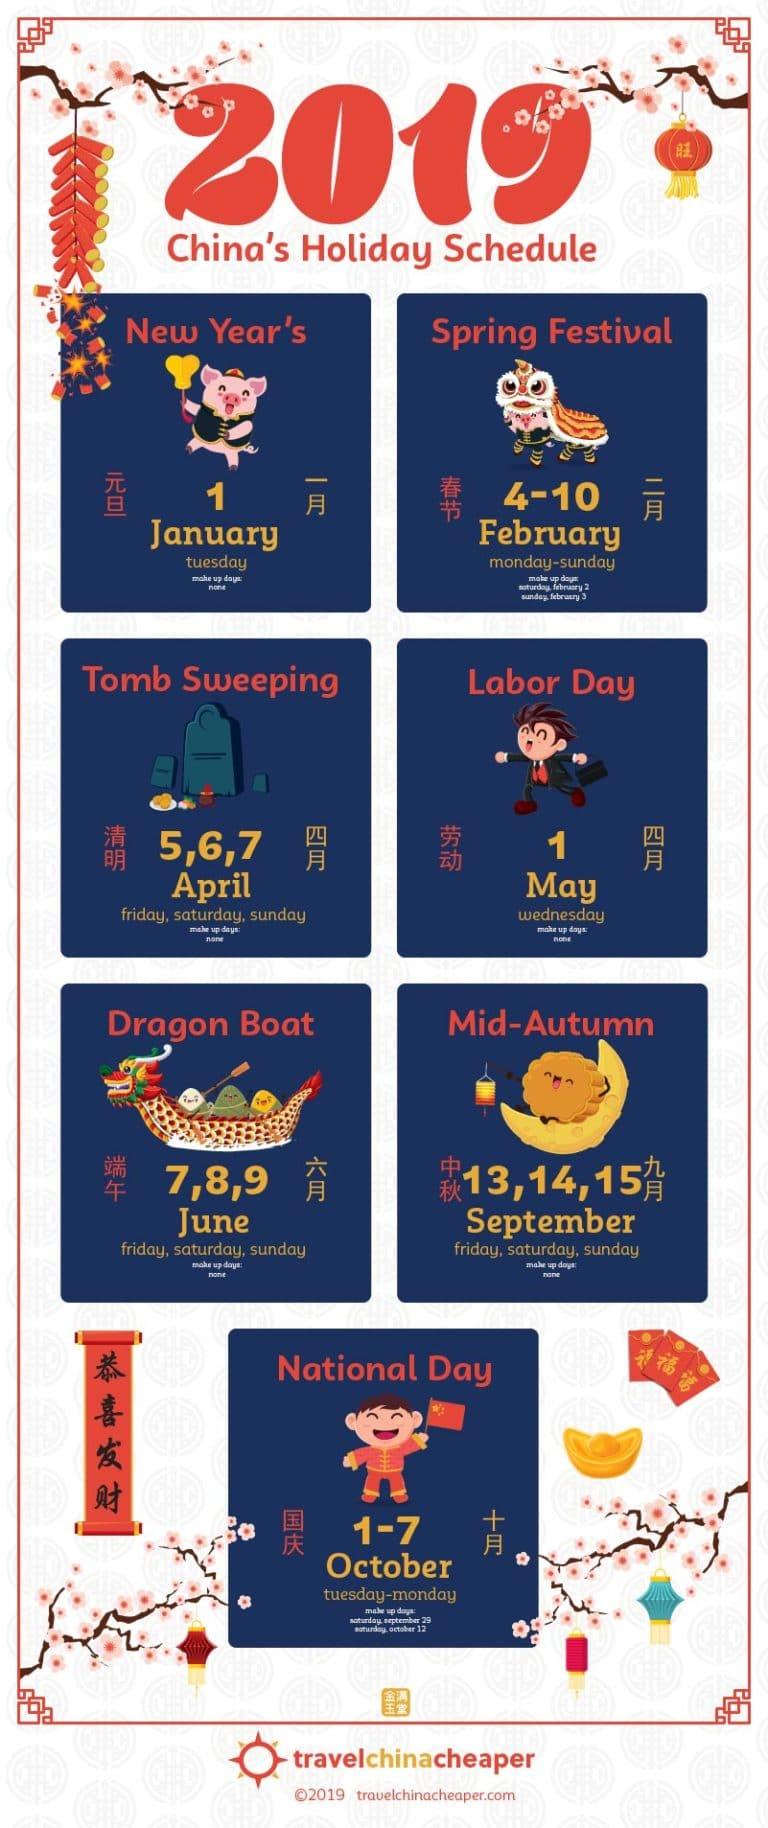 China holiday calendar 2019 infographic